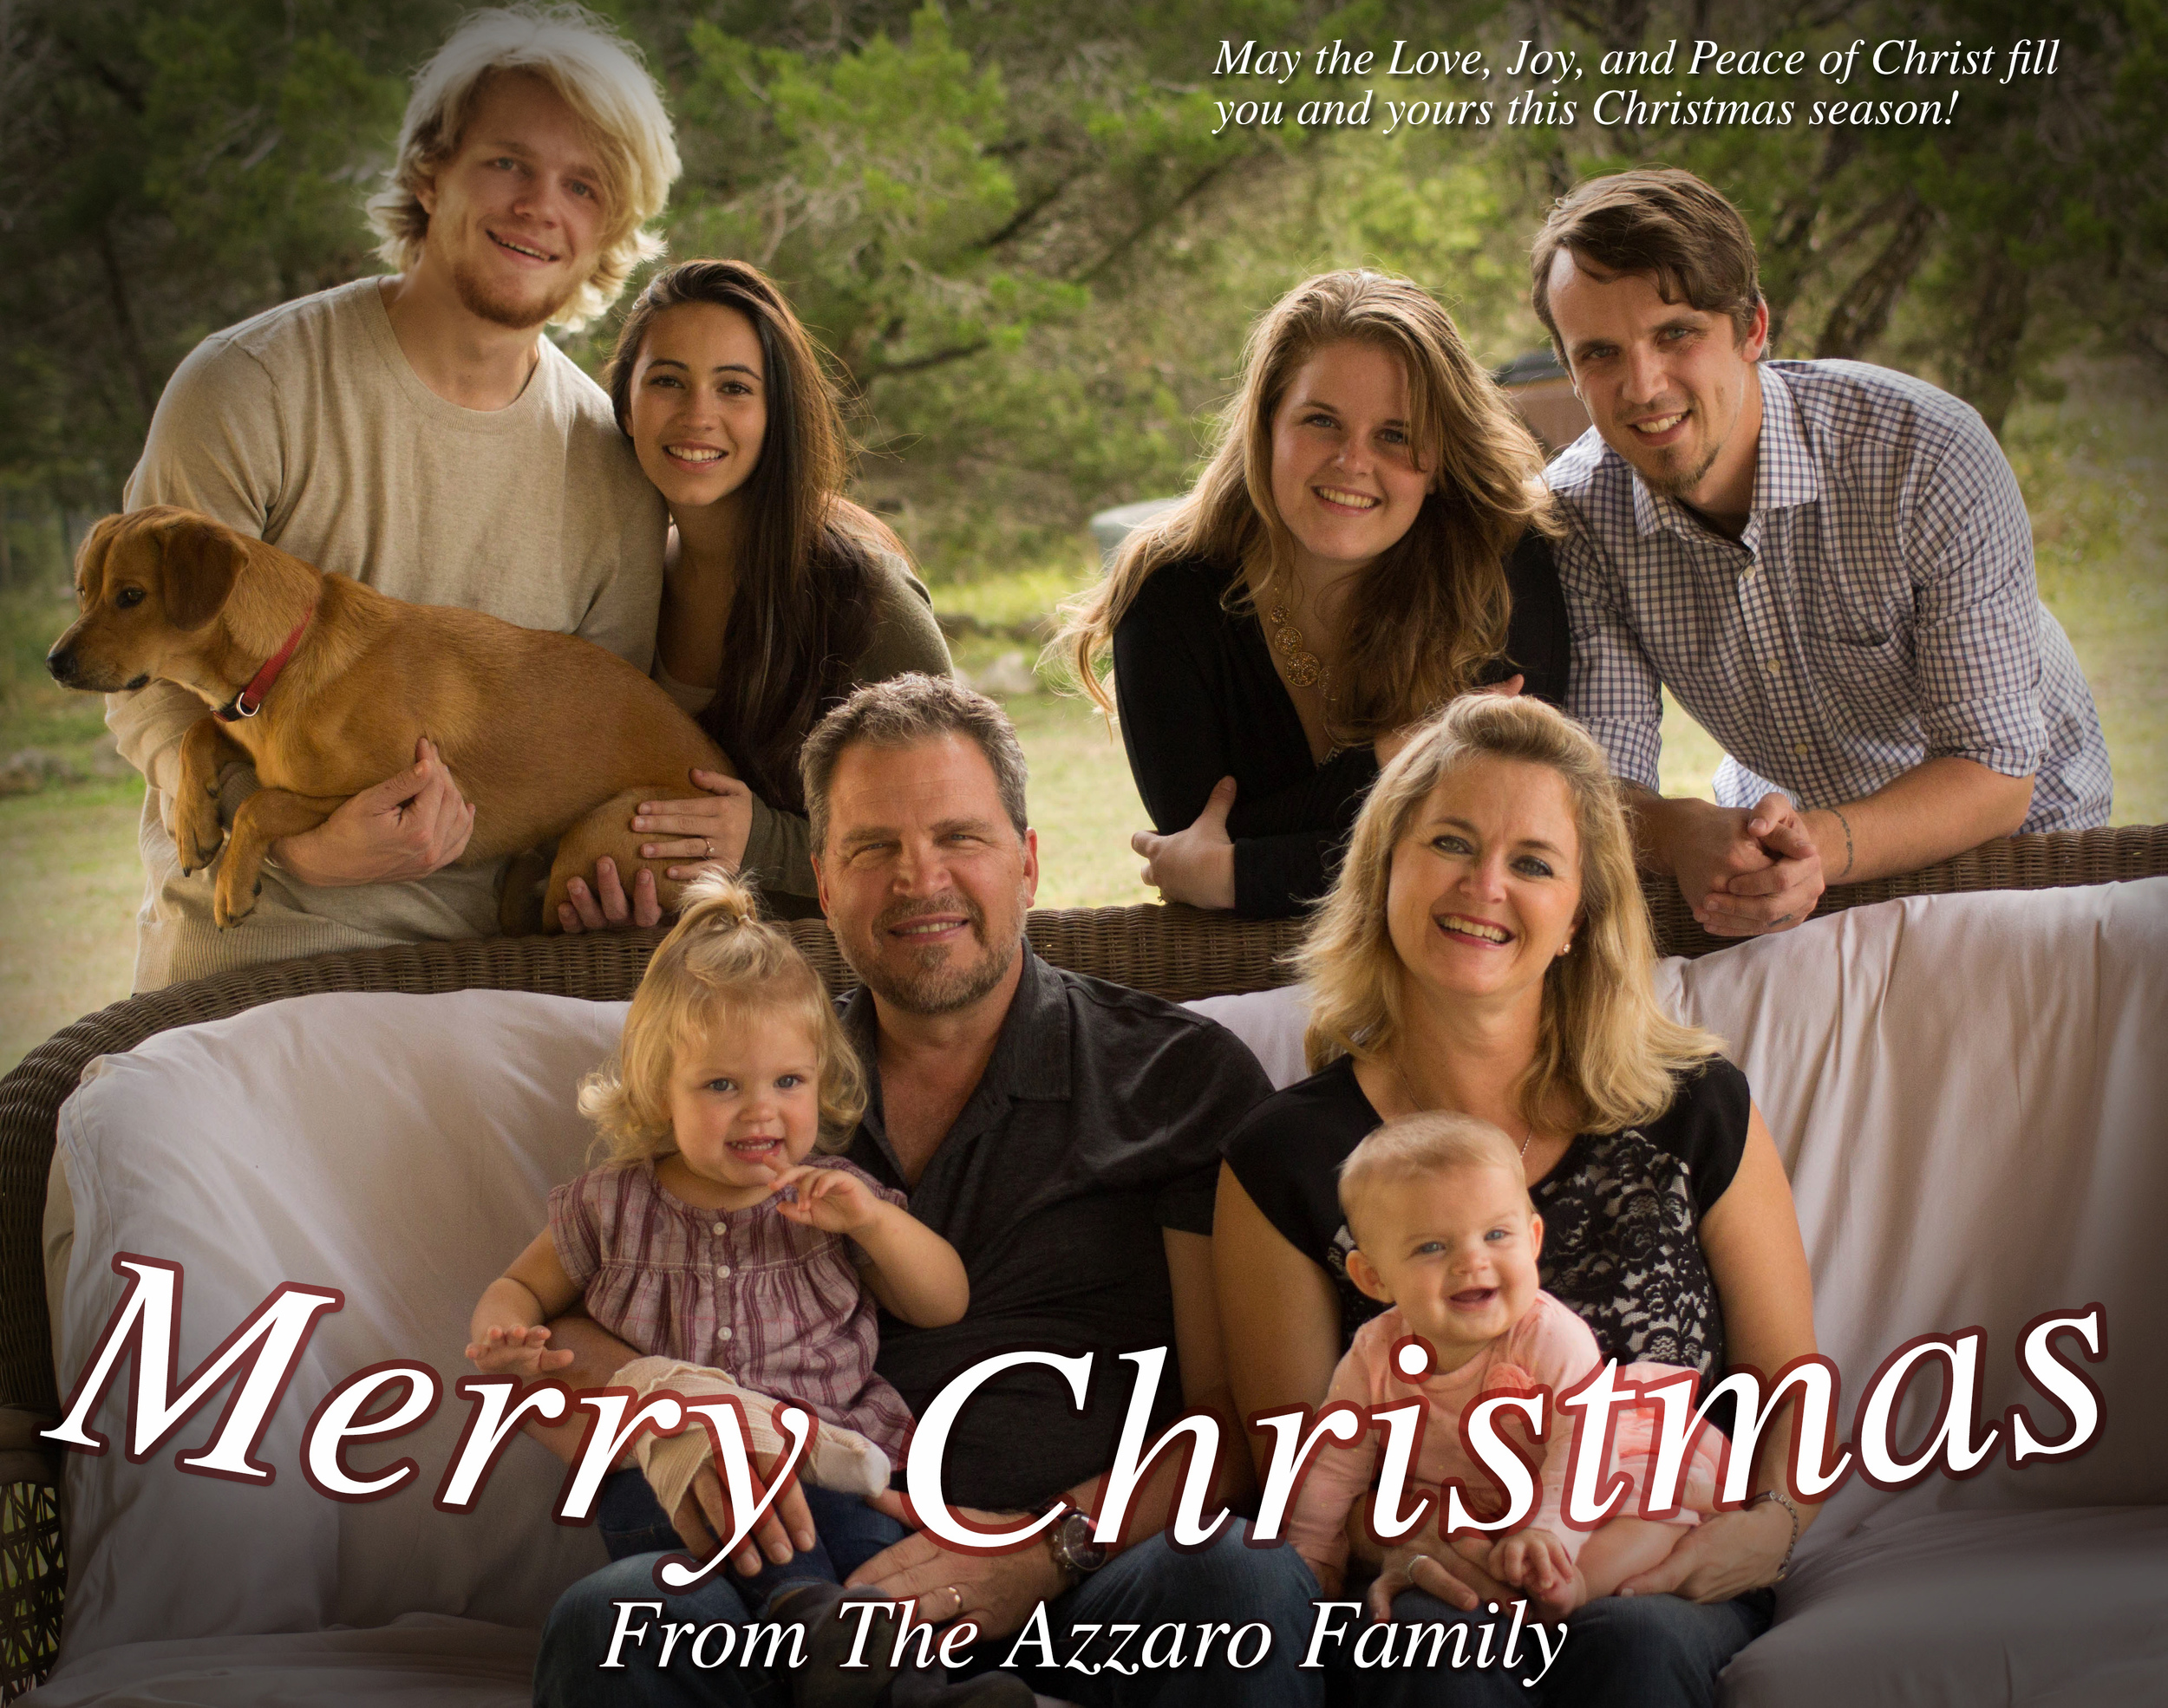 Azzaro Christmas Card.jpg